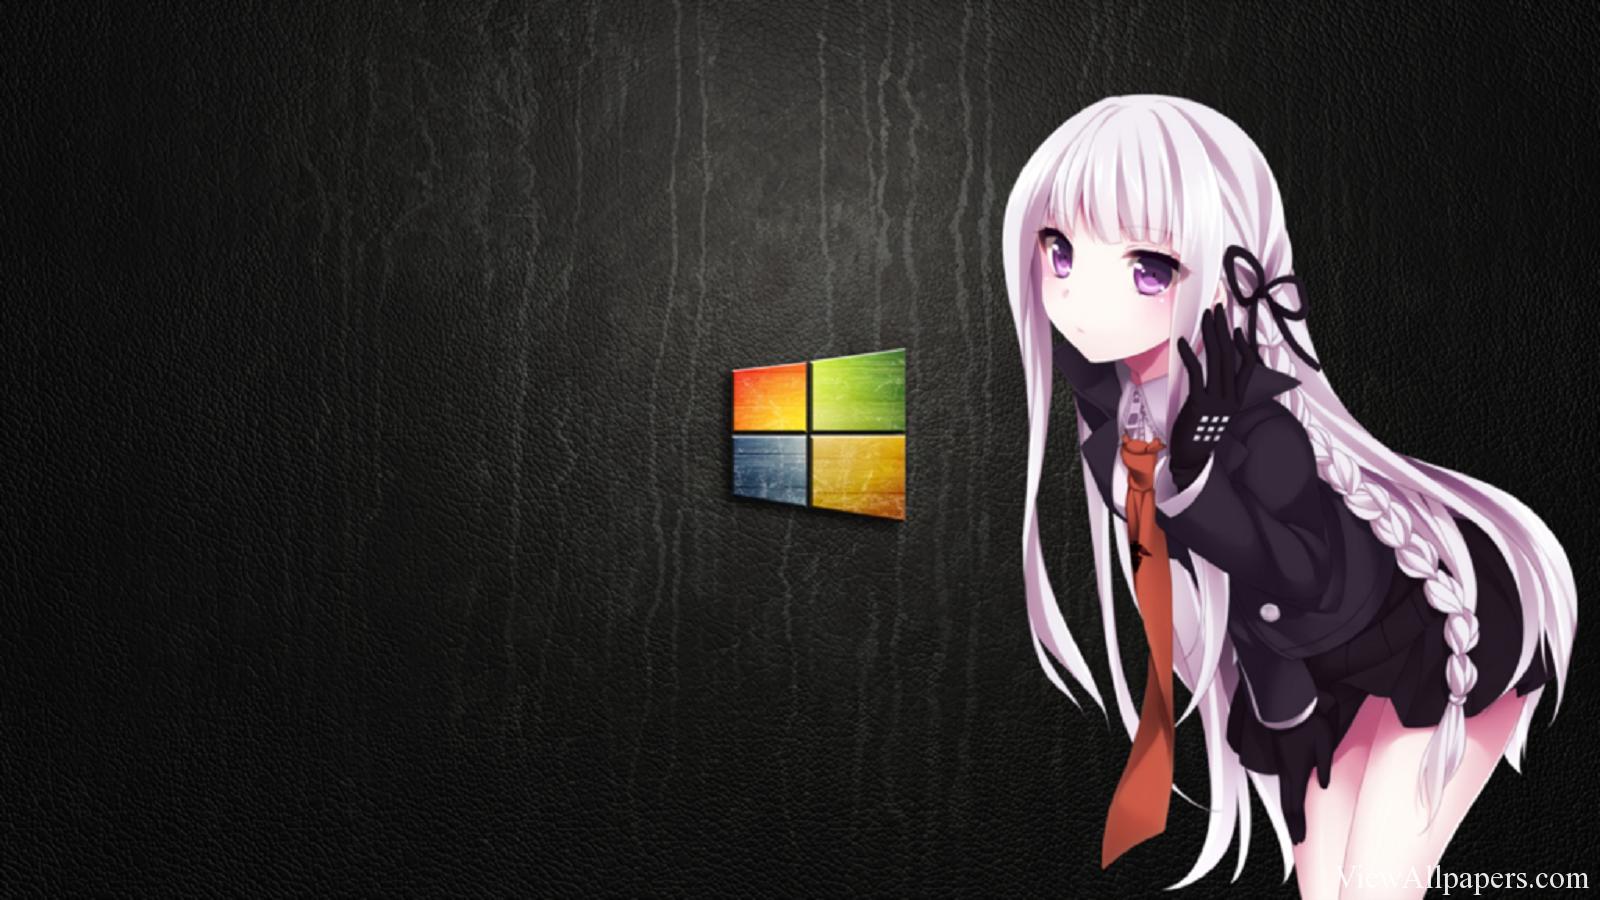 Anime Desktop Background - WallpaperSafari